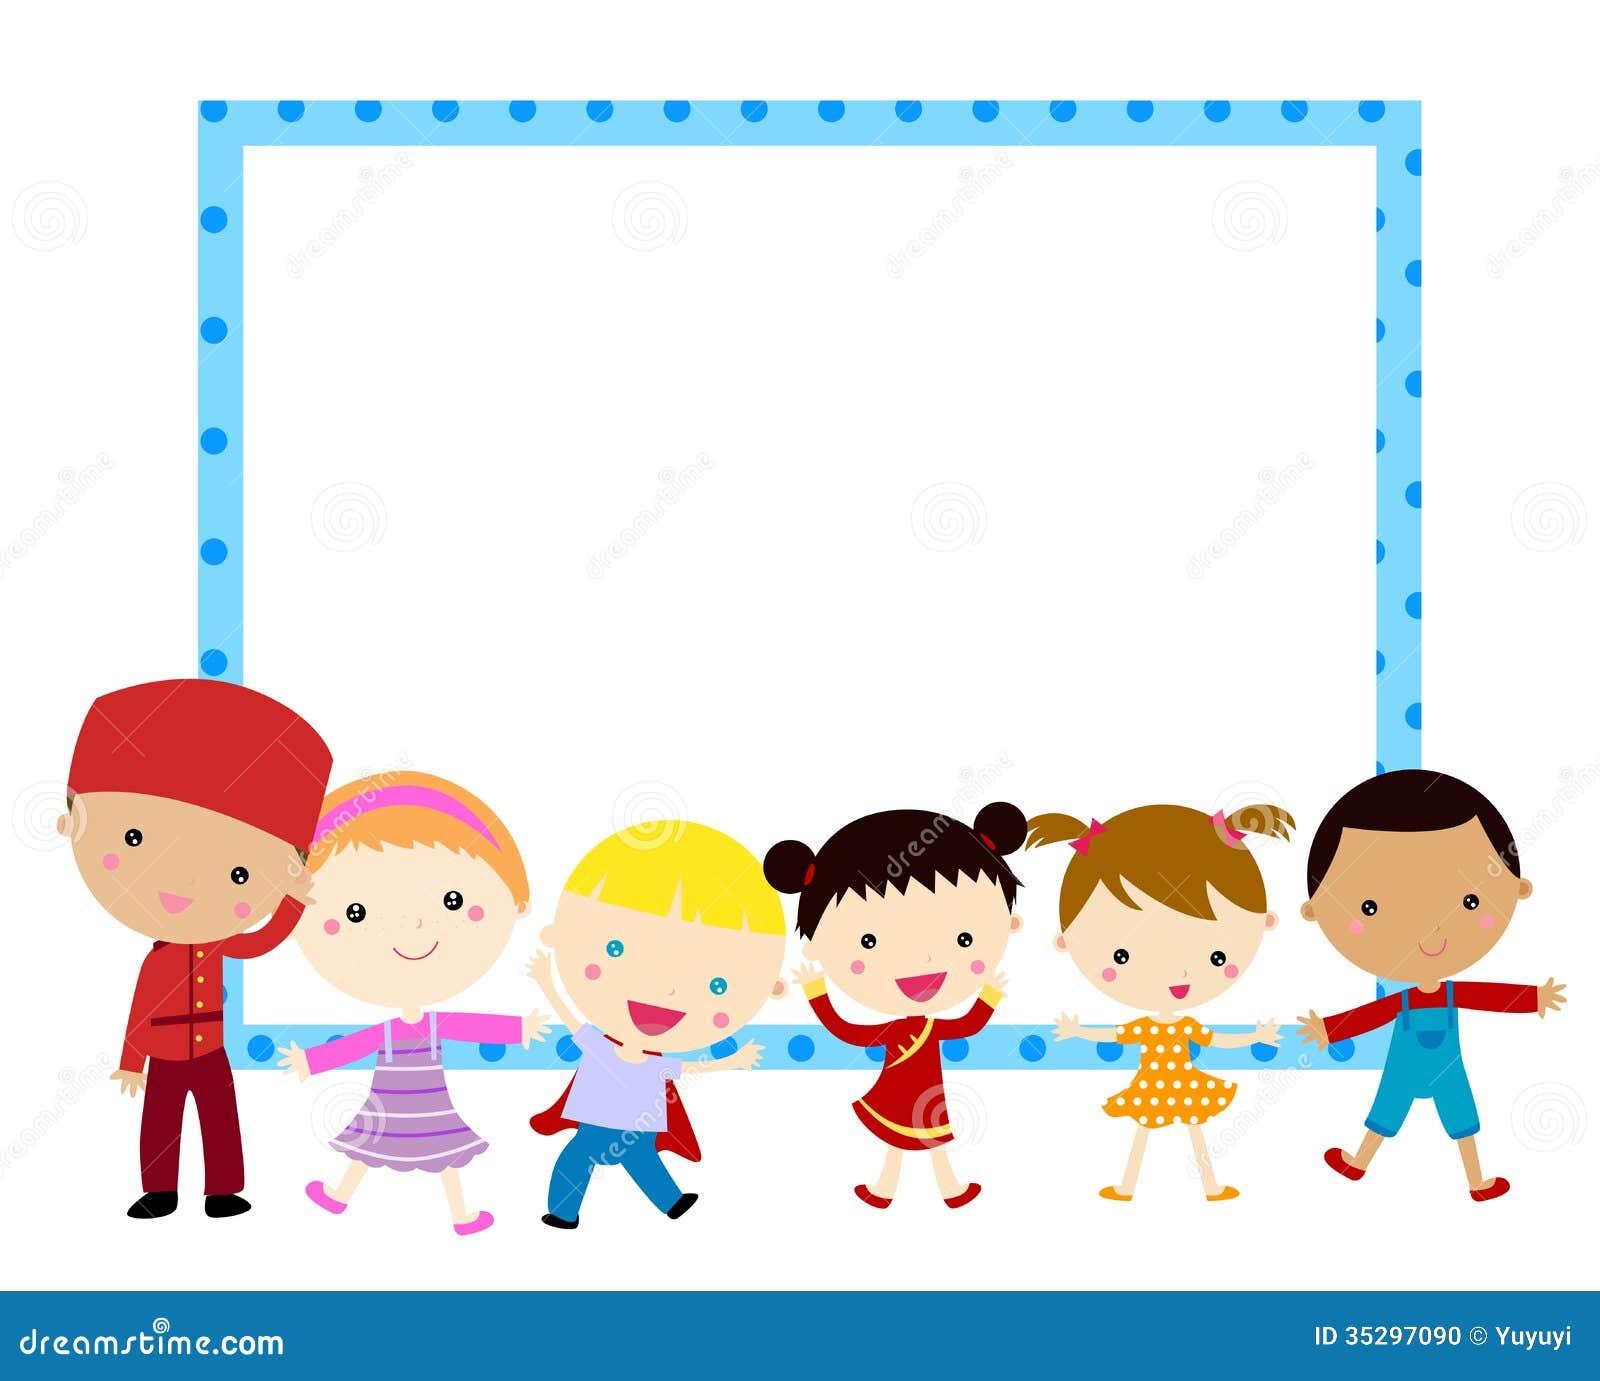 рамки для детей картинки